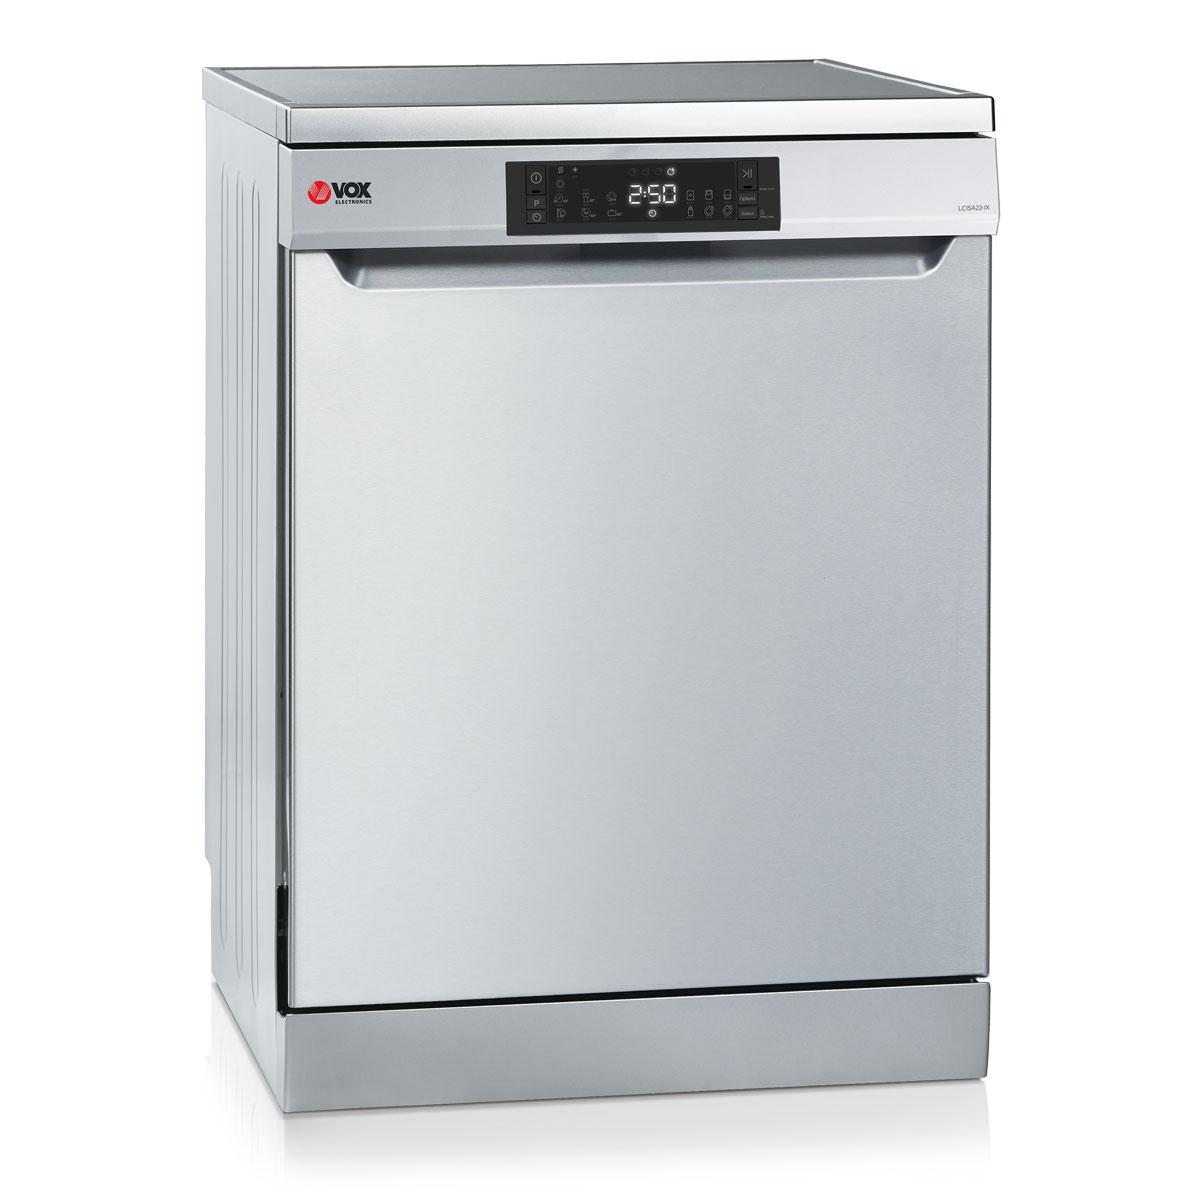 Dishwashers - Width 60 cm